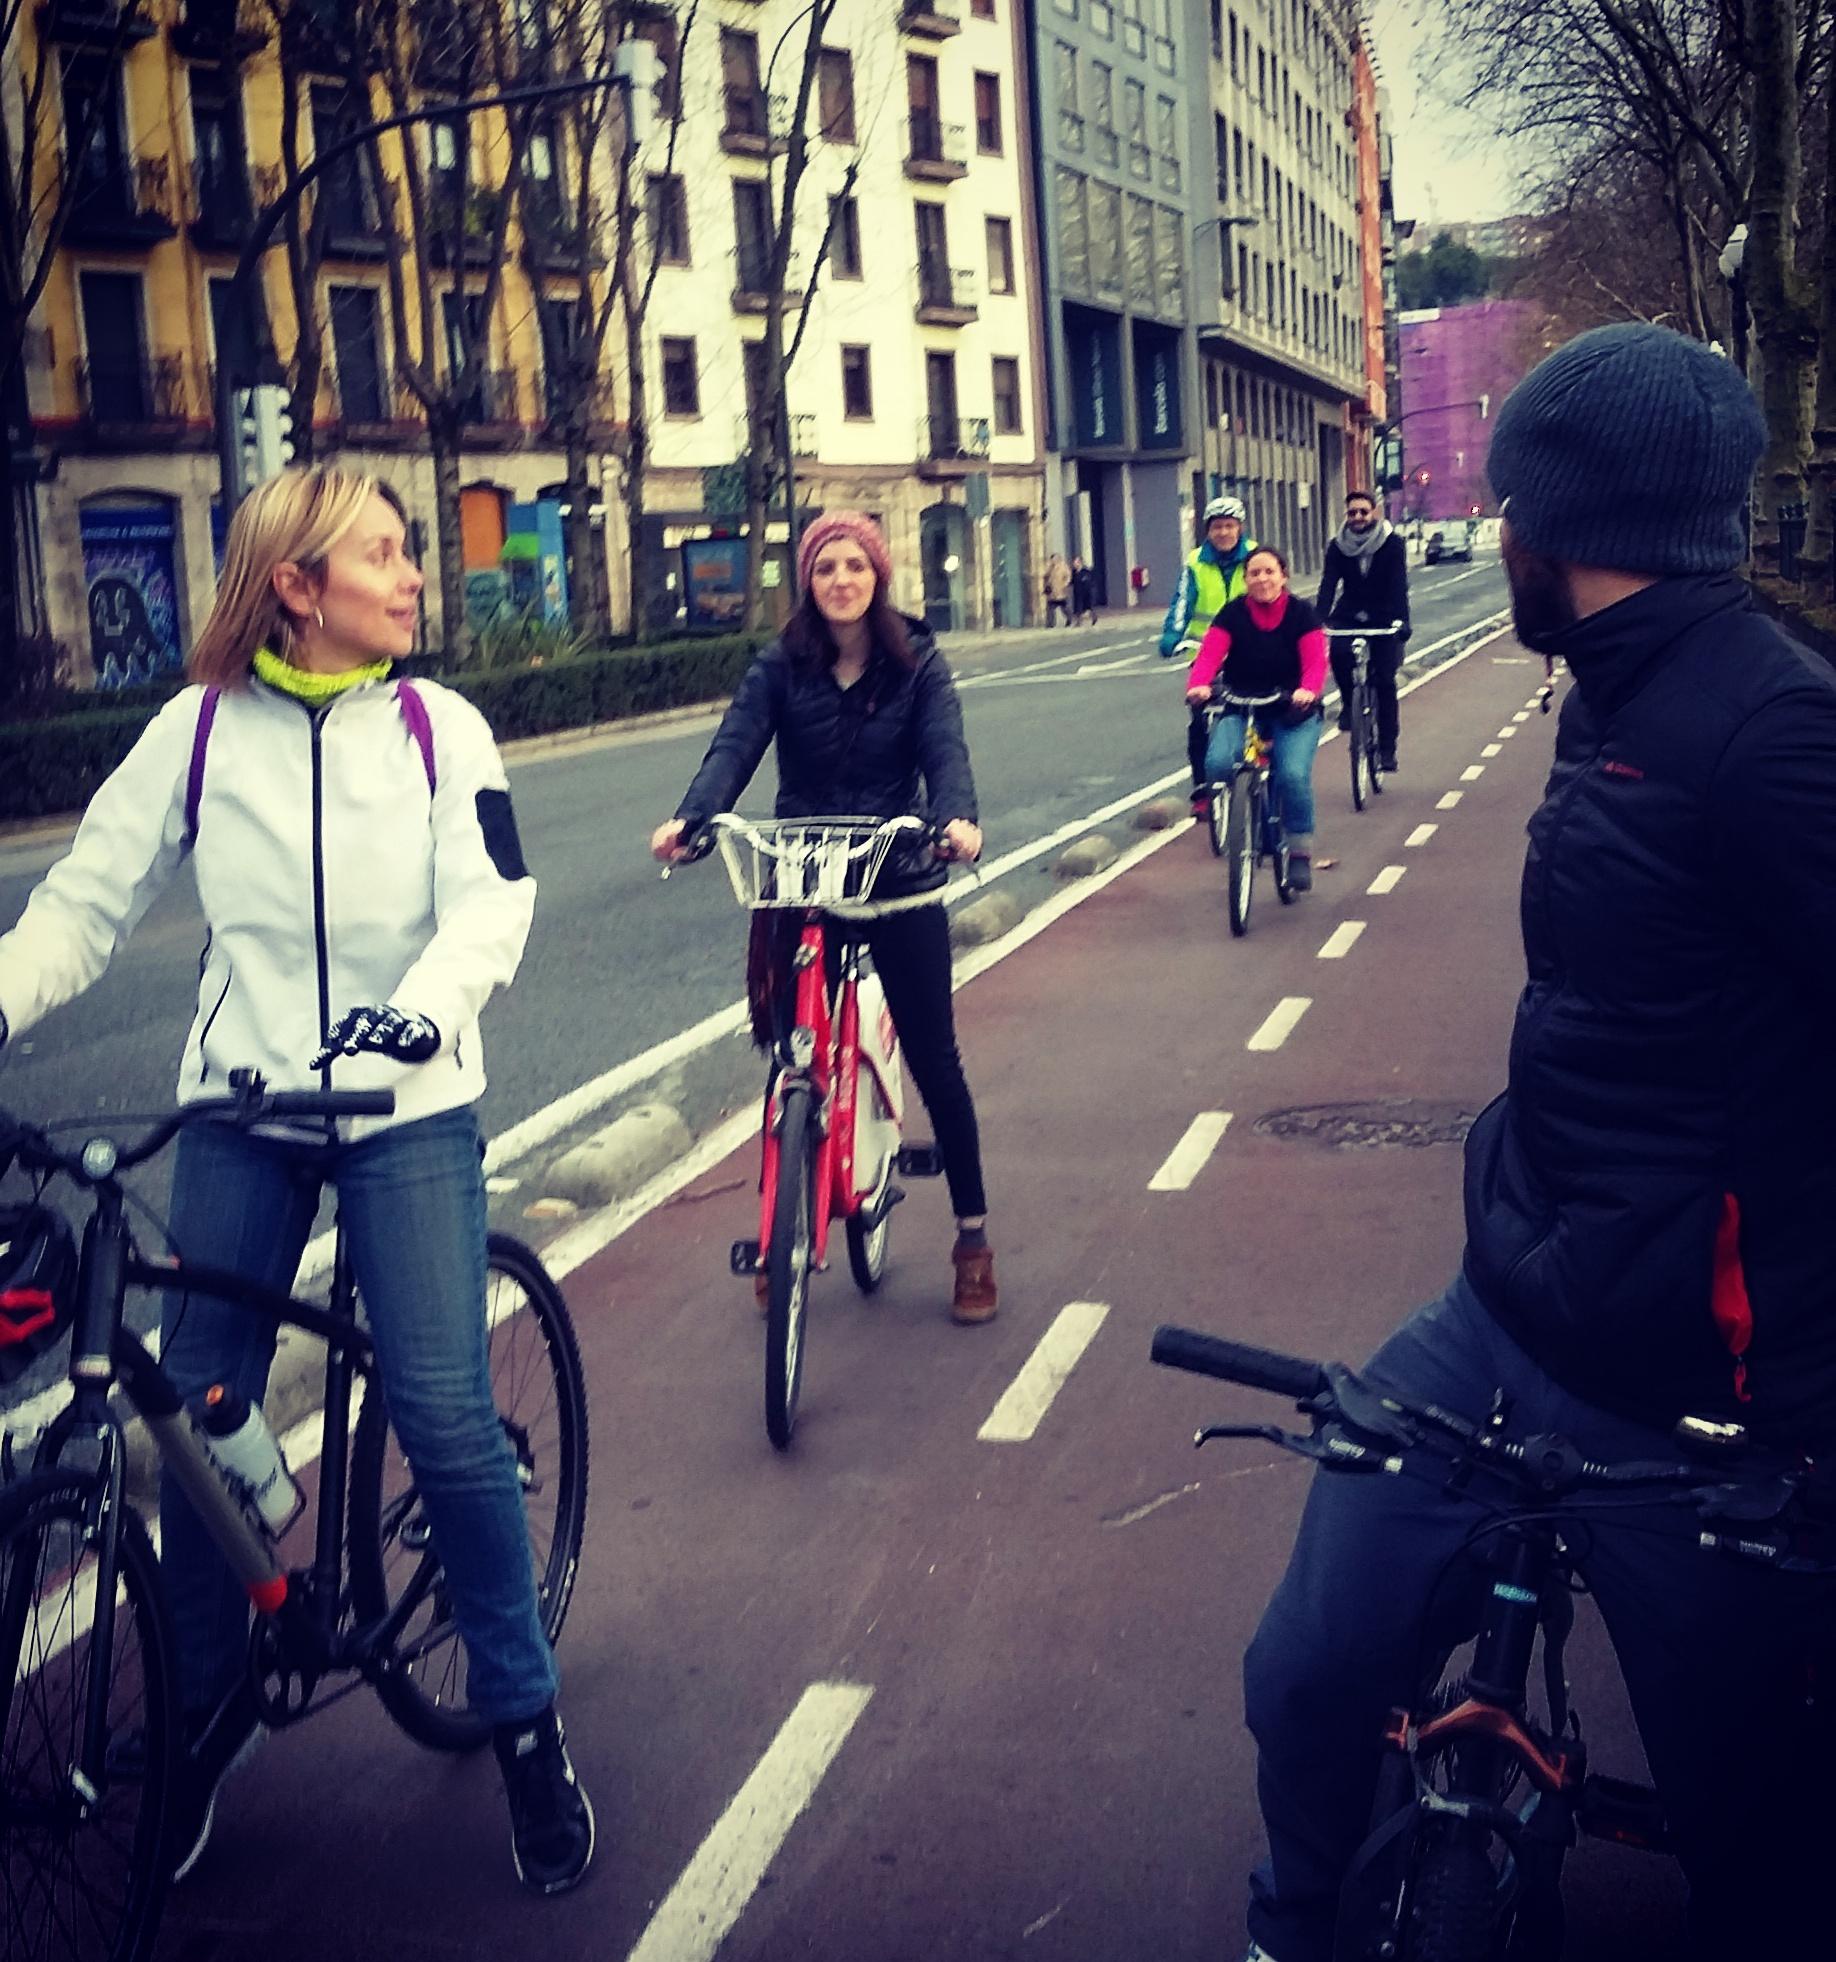 Video: aprender a andar en bici